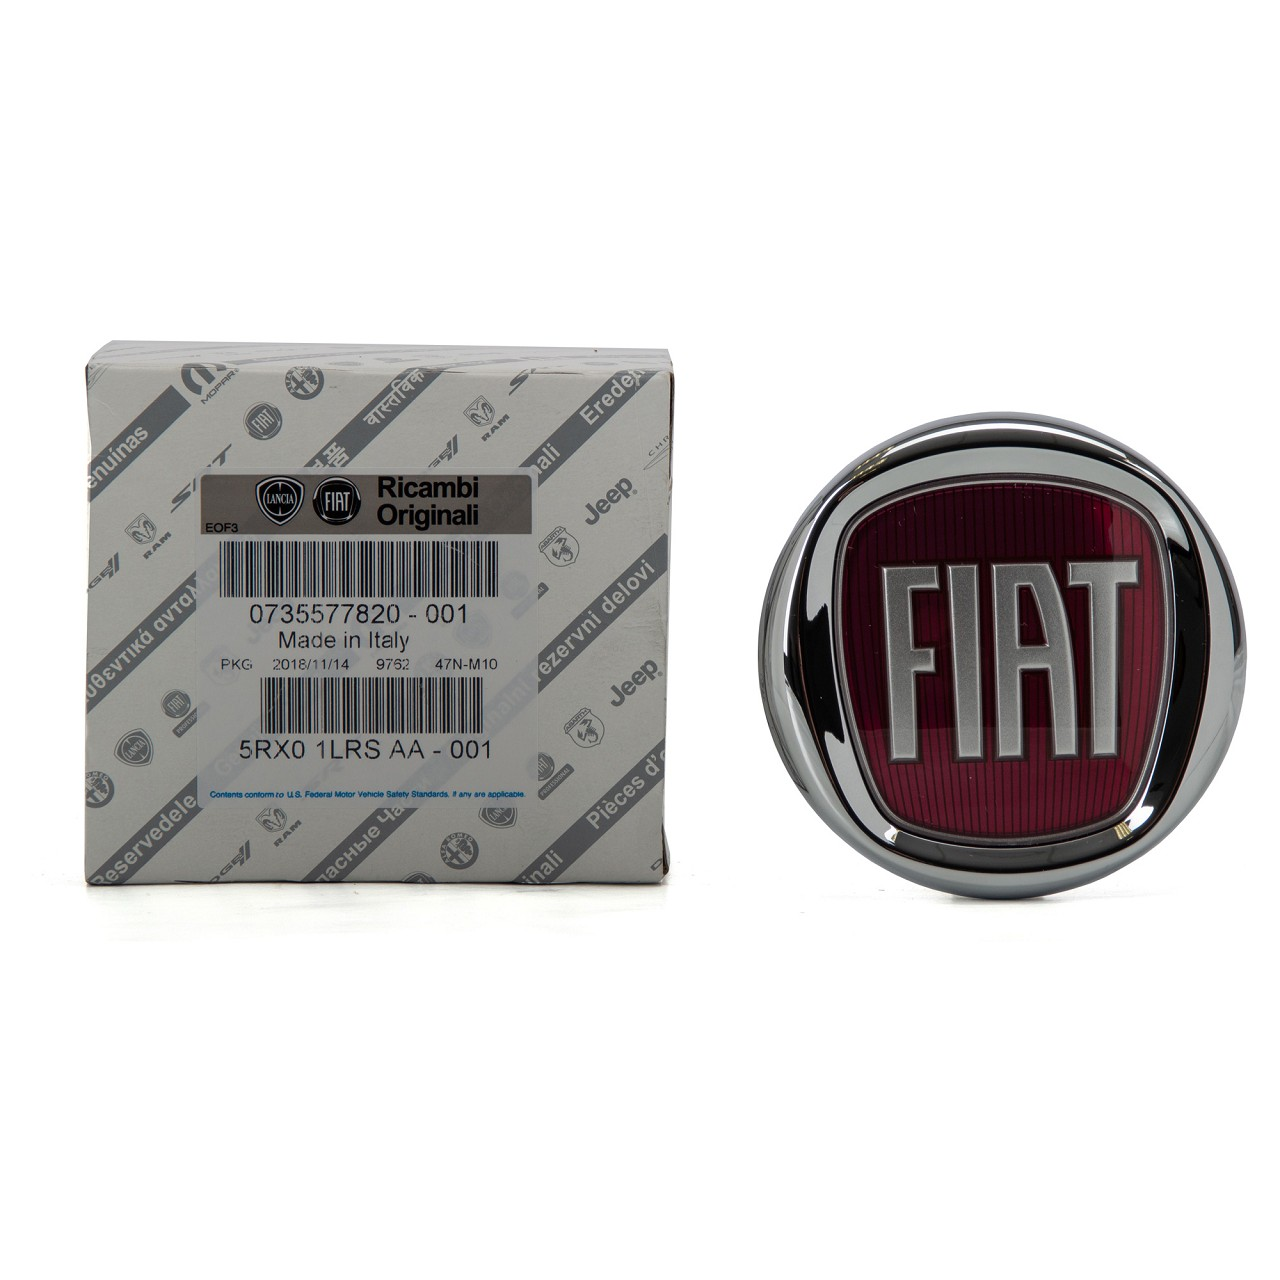 ORIGINAL Fiat Emblem Plakette Logo DOBLO GRANDE PUNTO 199 IDEA hinten 735577820